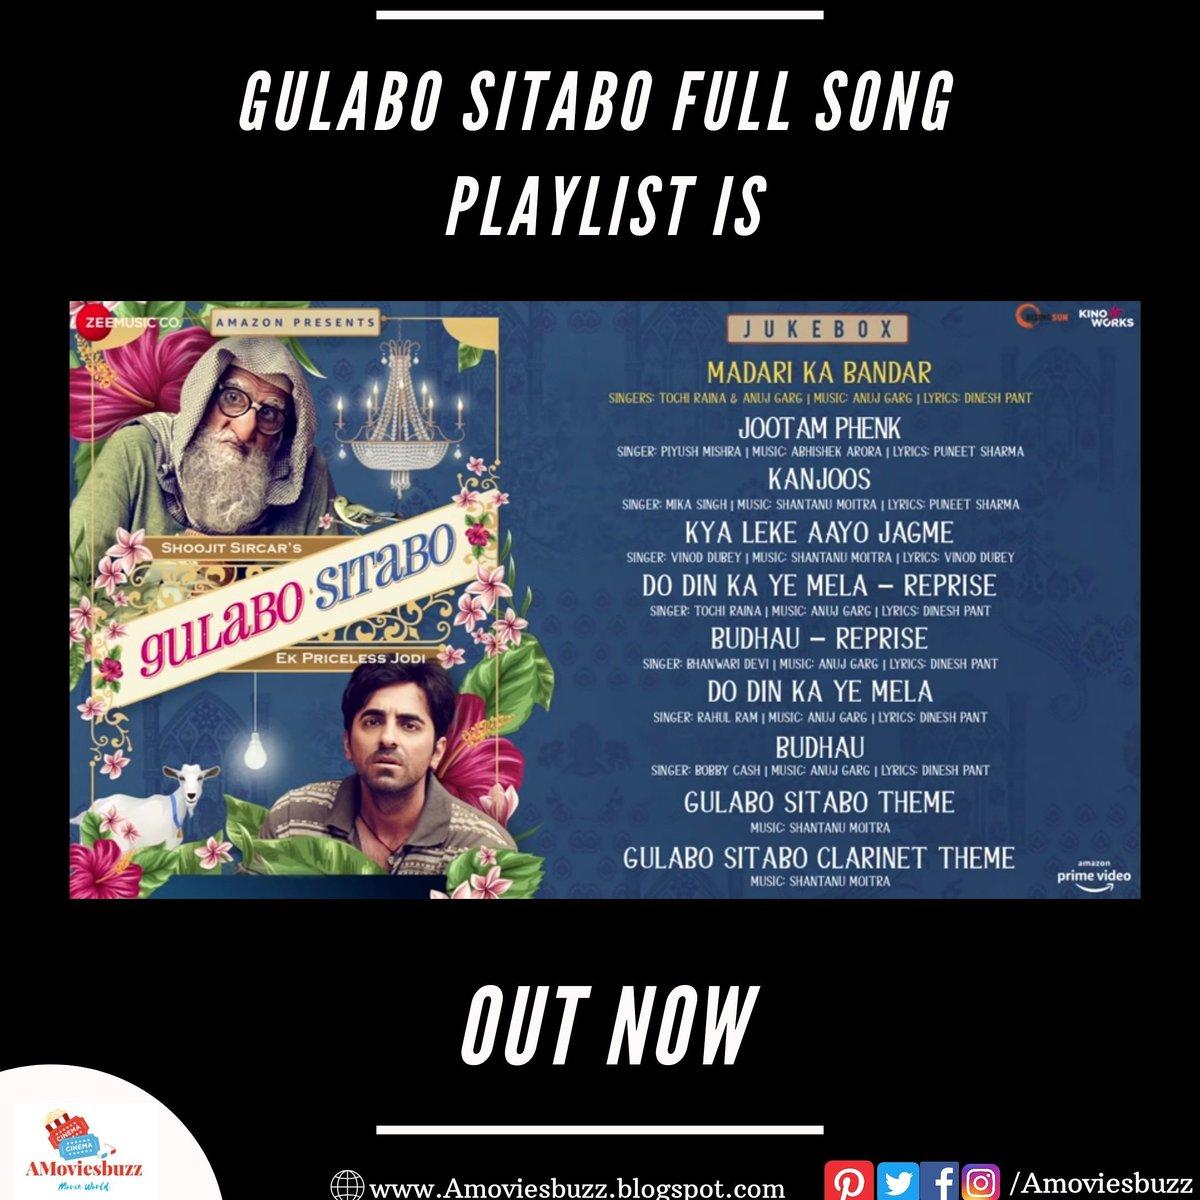 #gulabositabo  Full Song Playlist Is Out Now. @Ayushmann k @amitabhbachchan #soojitsircar  @zeemusiccompany  For More Update Follow Us  #bollywoodupdates #movies #bollywood #moviesupdate #webseries #webseriesupdates #moviereview #webseriesreview #gulabositabopic.twitter.com/quOvFWTUlC